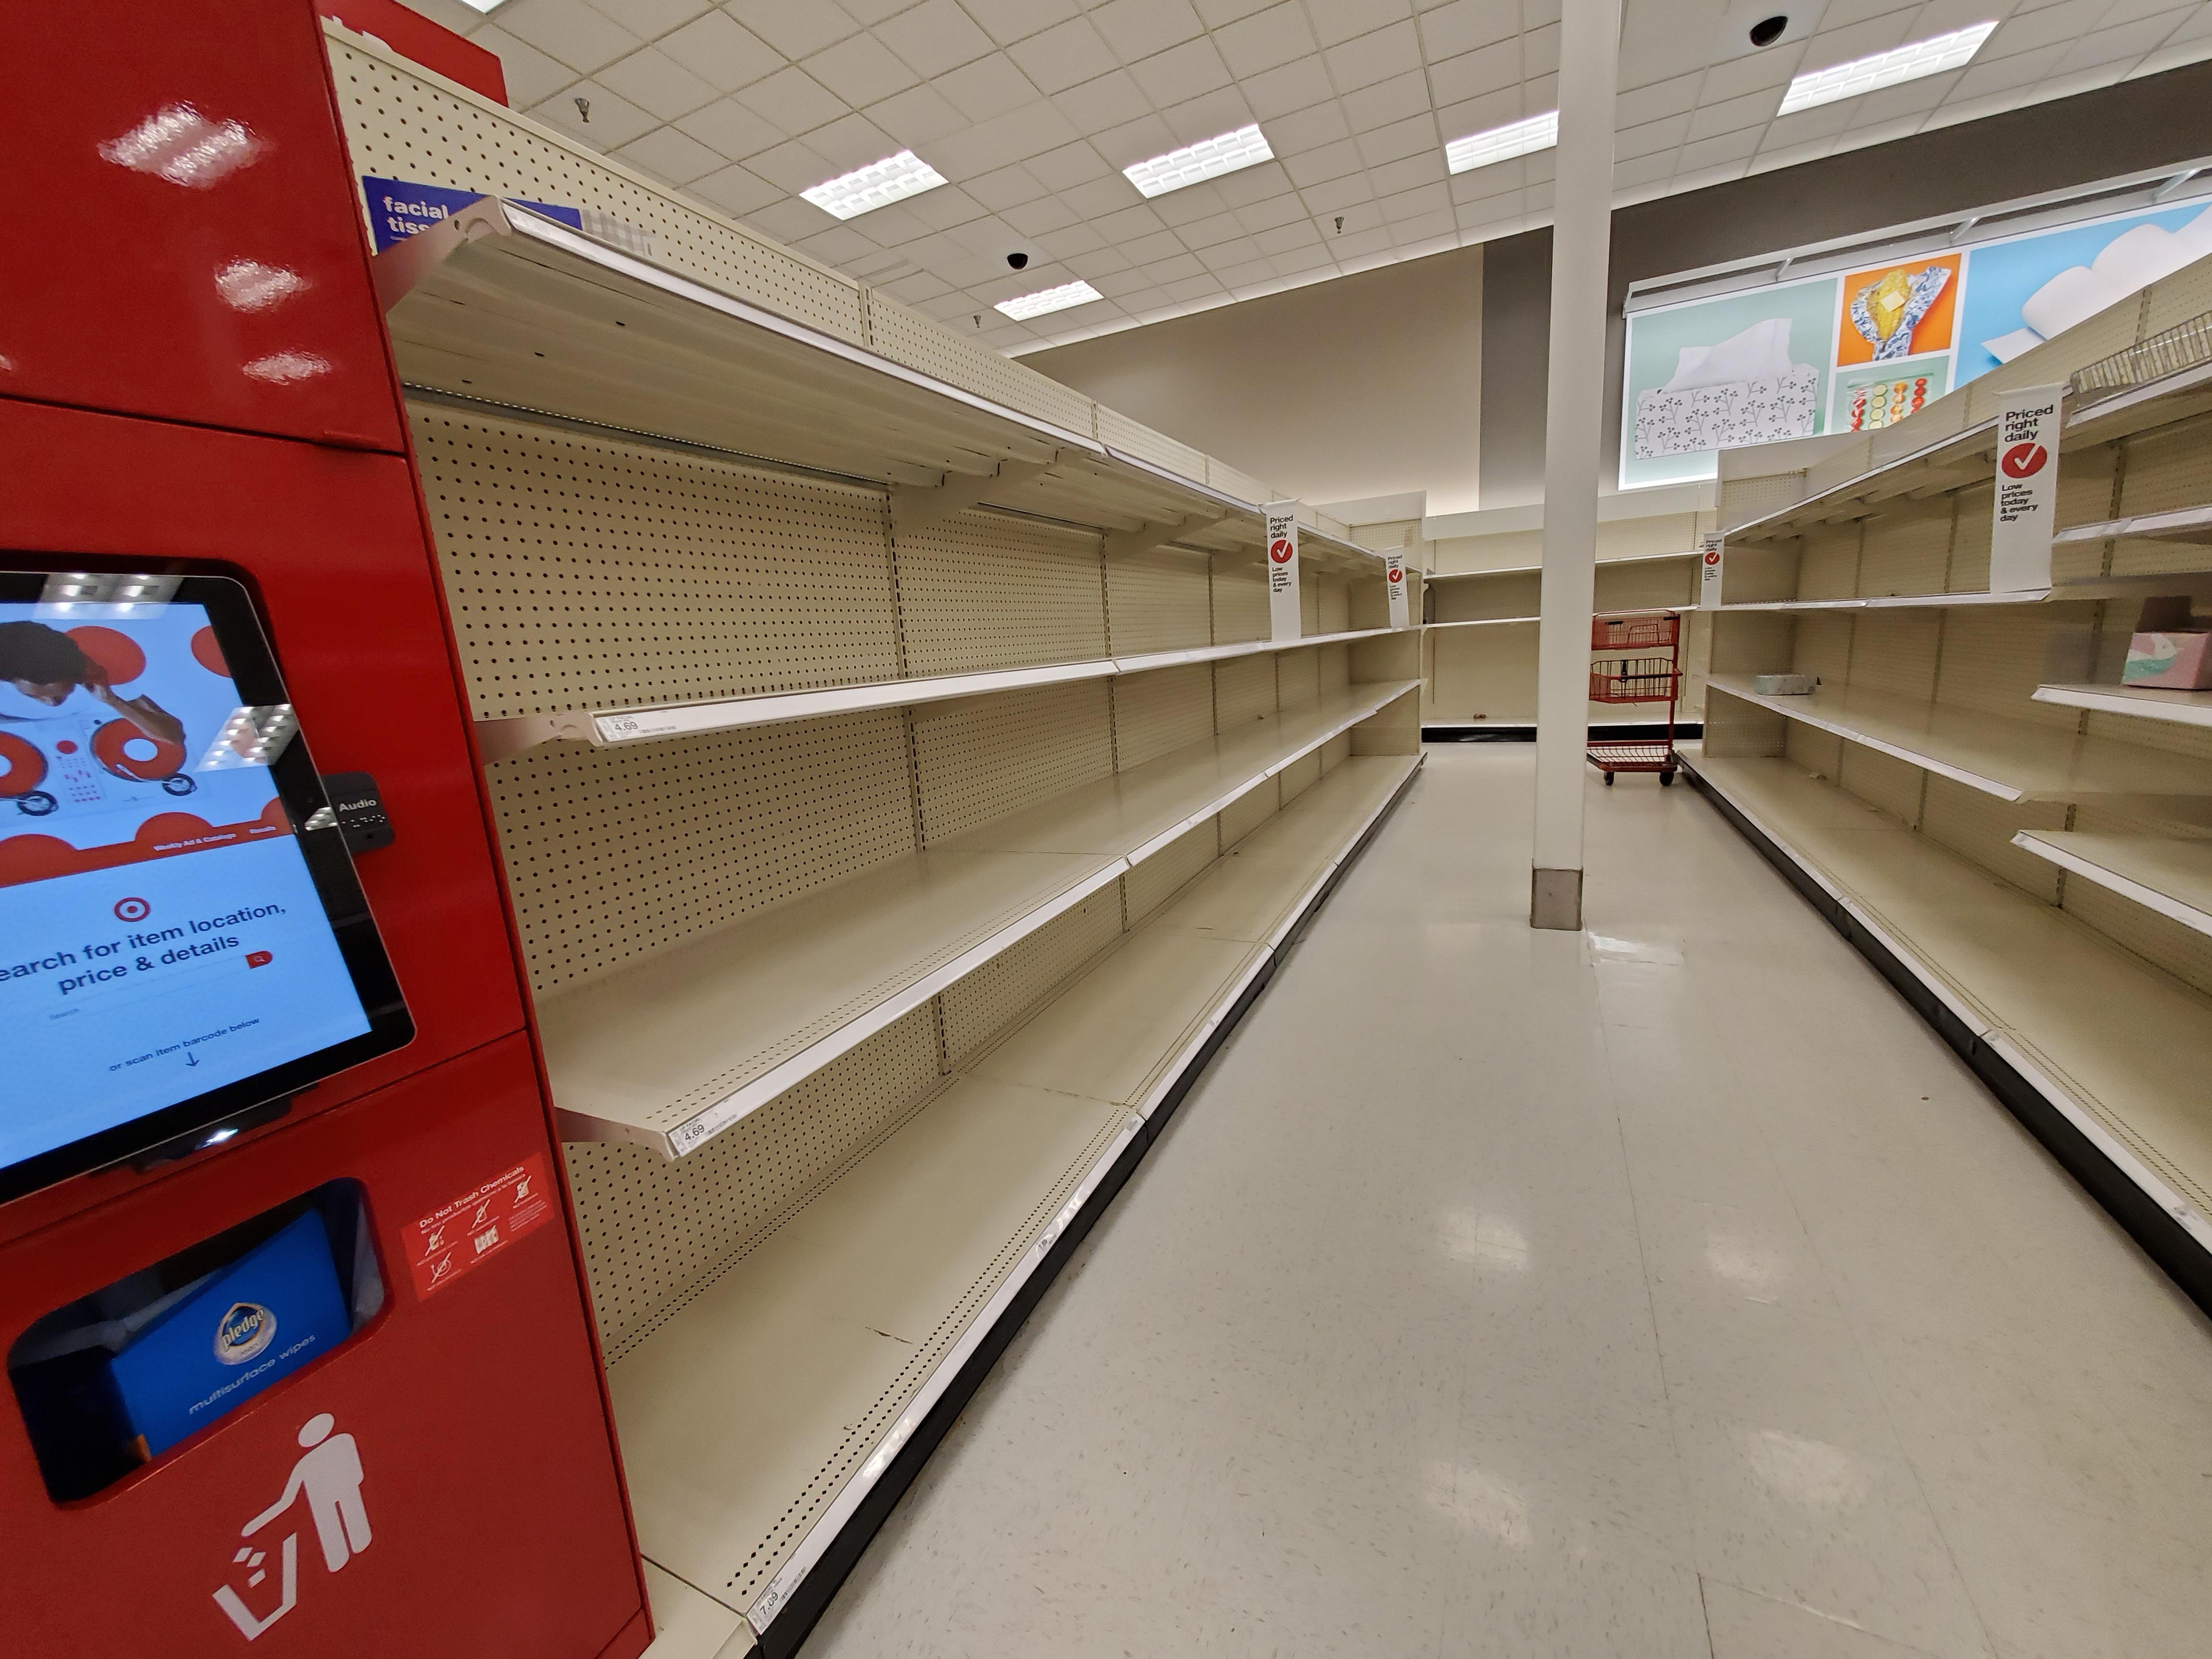 COVID-19 Empty Target Shelves